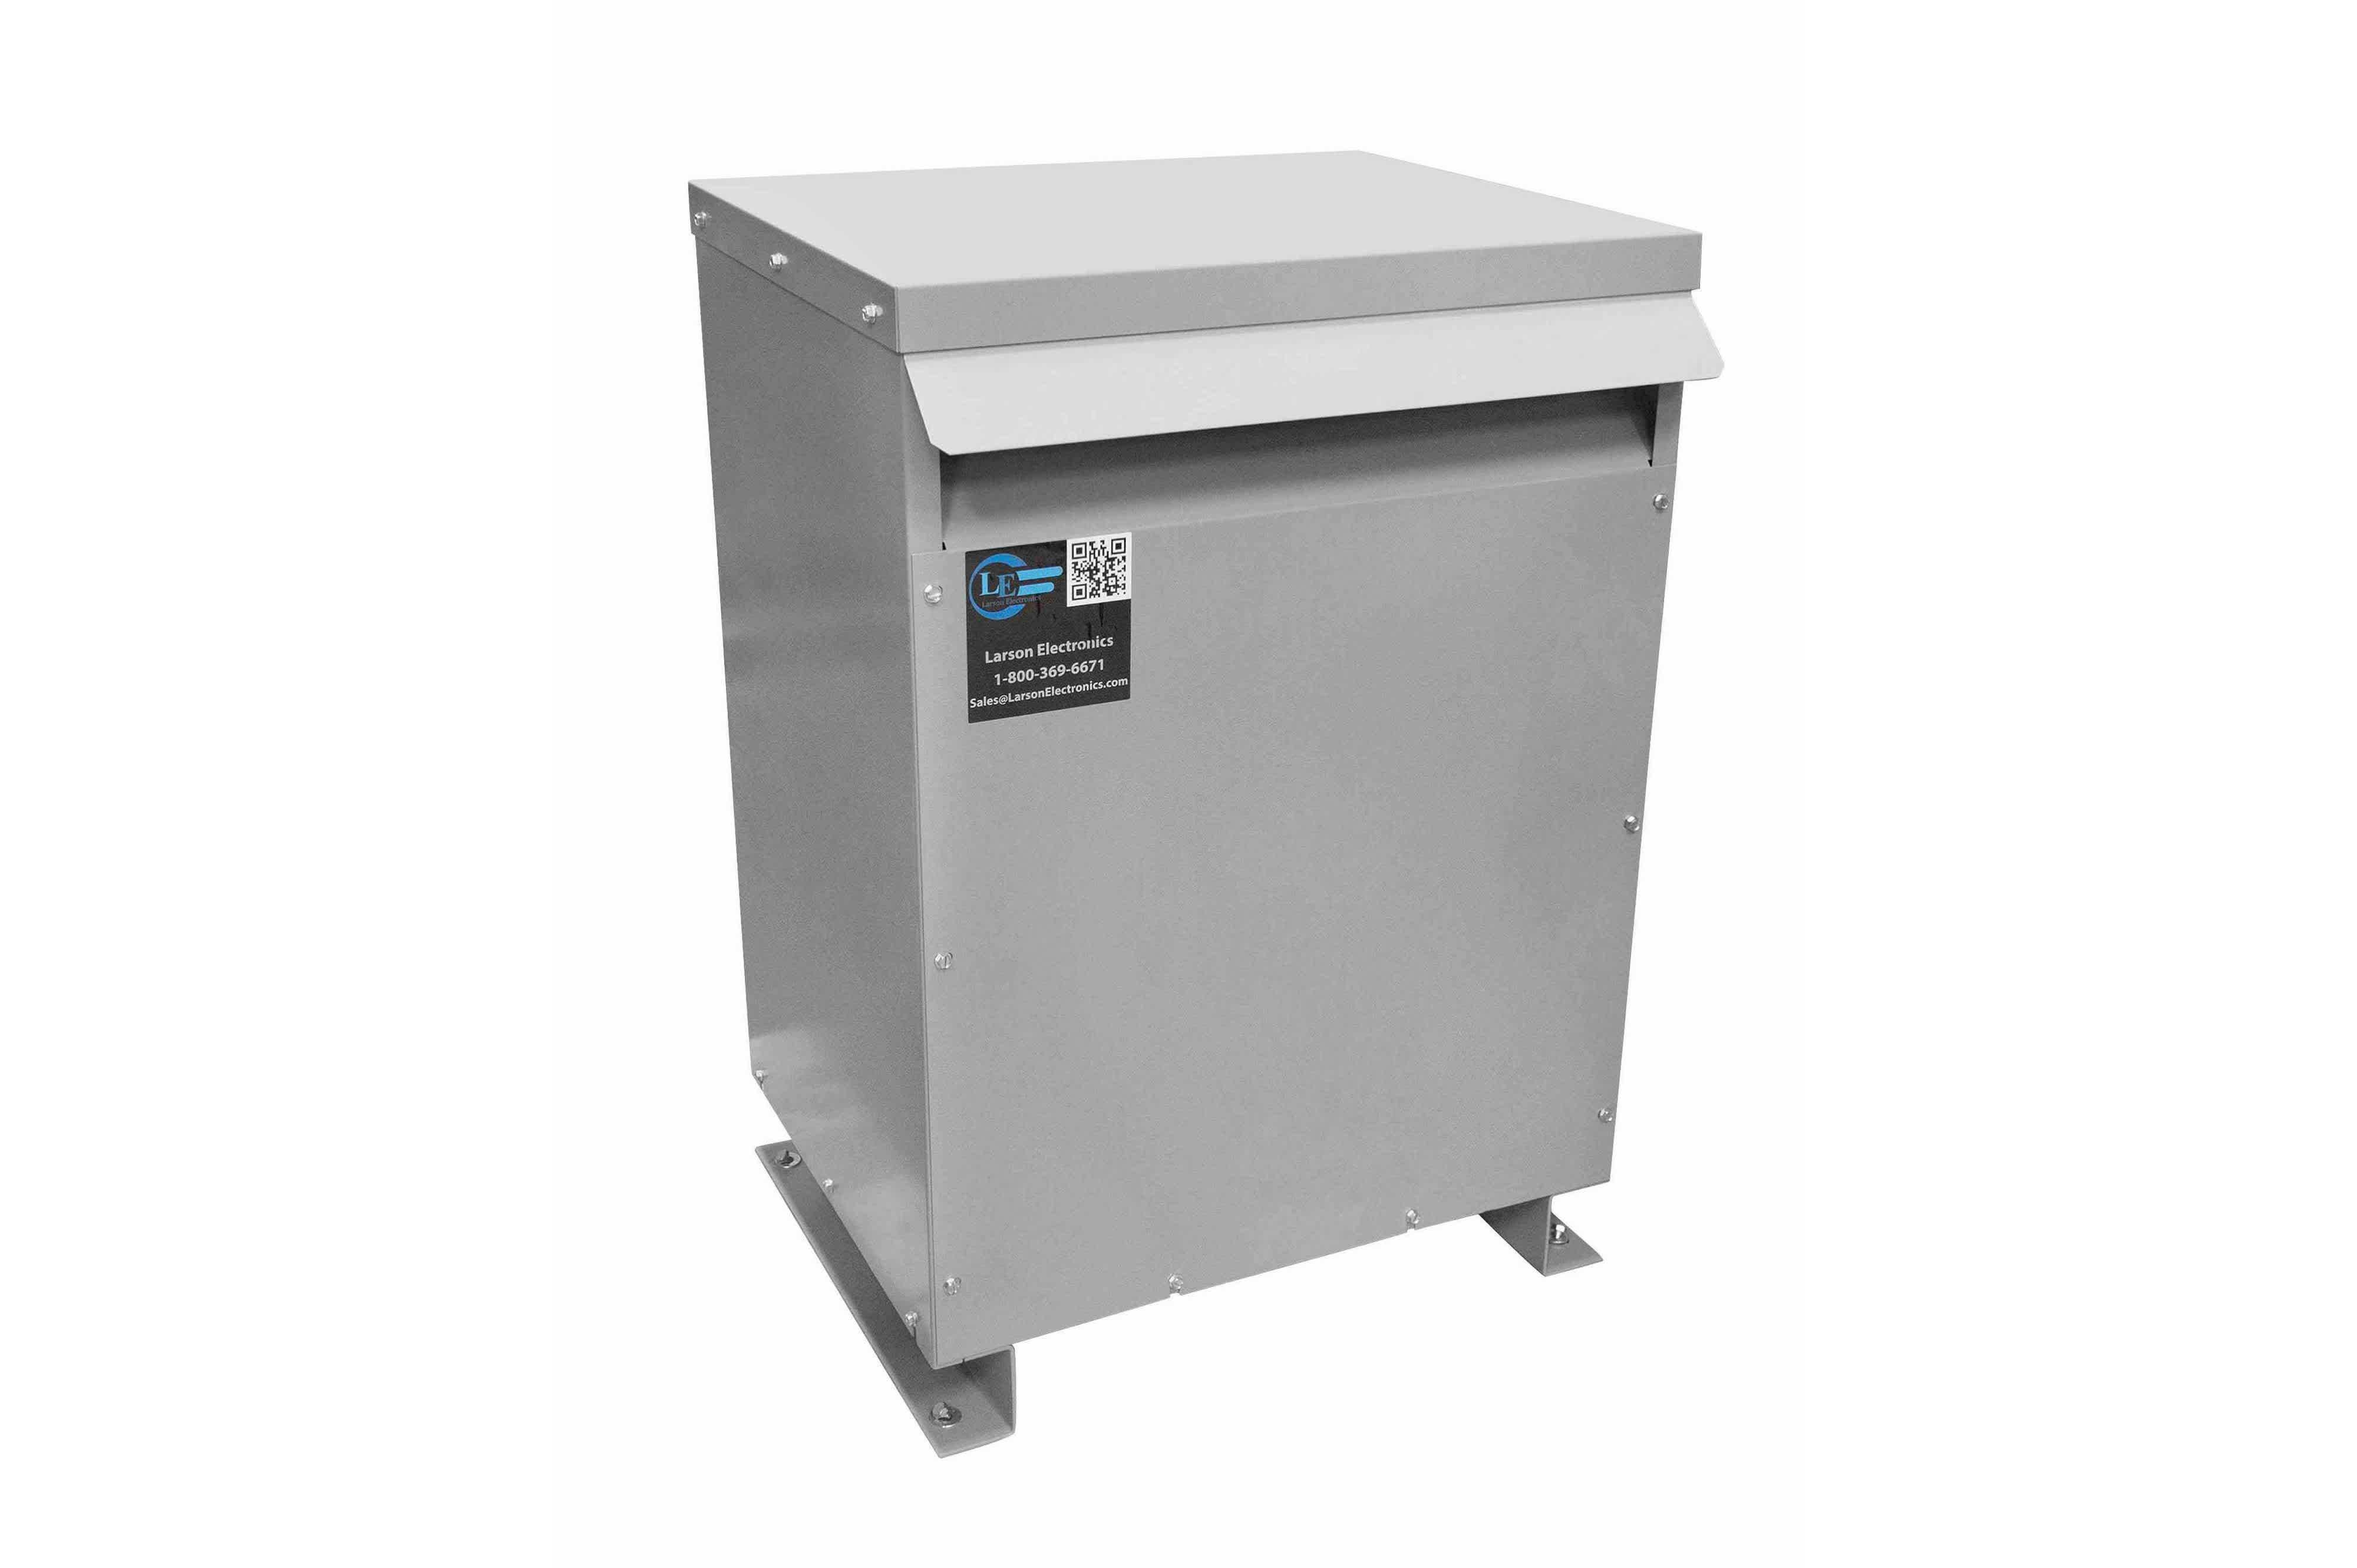 900 kVA 3PH Isolation Transformer, 480V Wye Primary, 575Y/332 Wye-N Secondary, N3R, Ventilated, 60 Hz